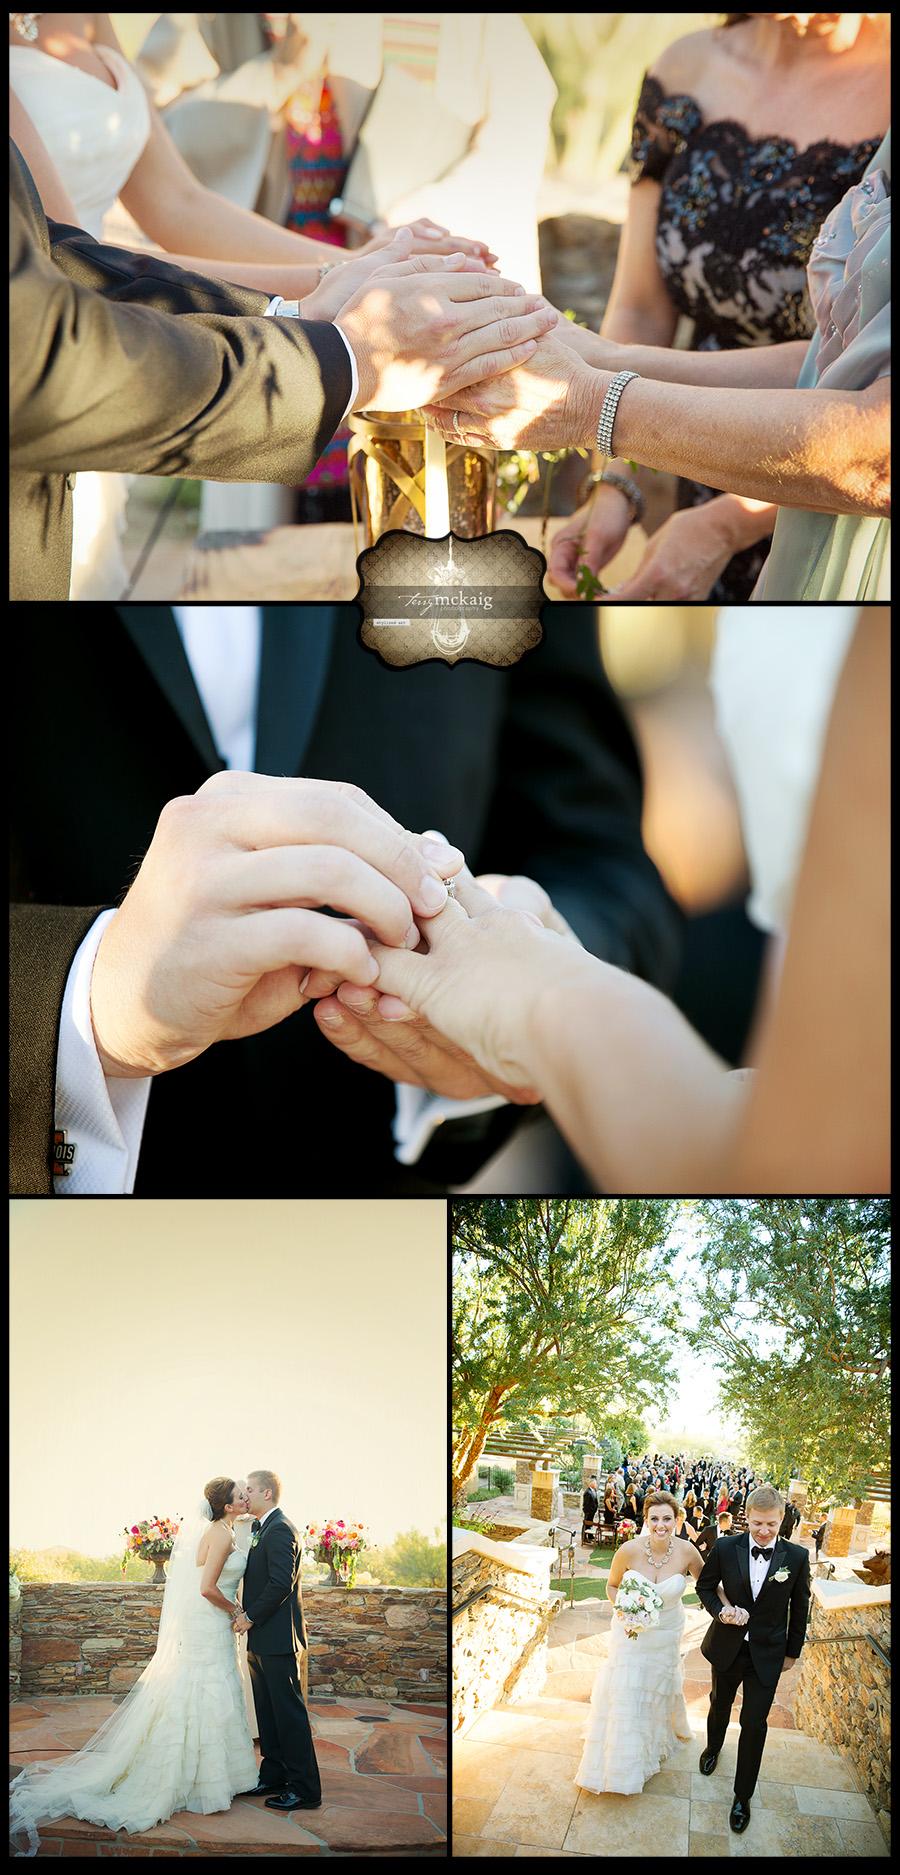 Kurt and amanda wedding